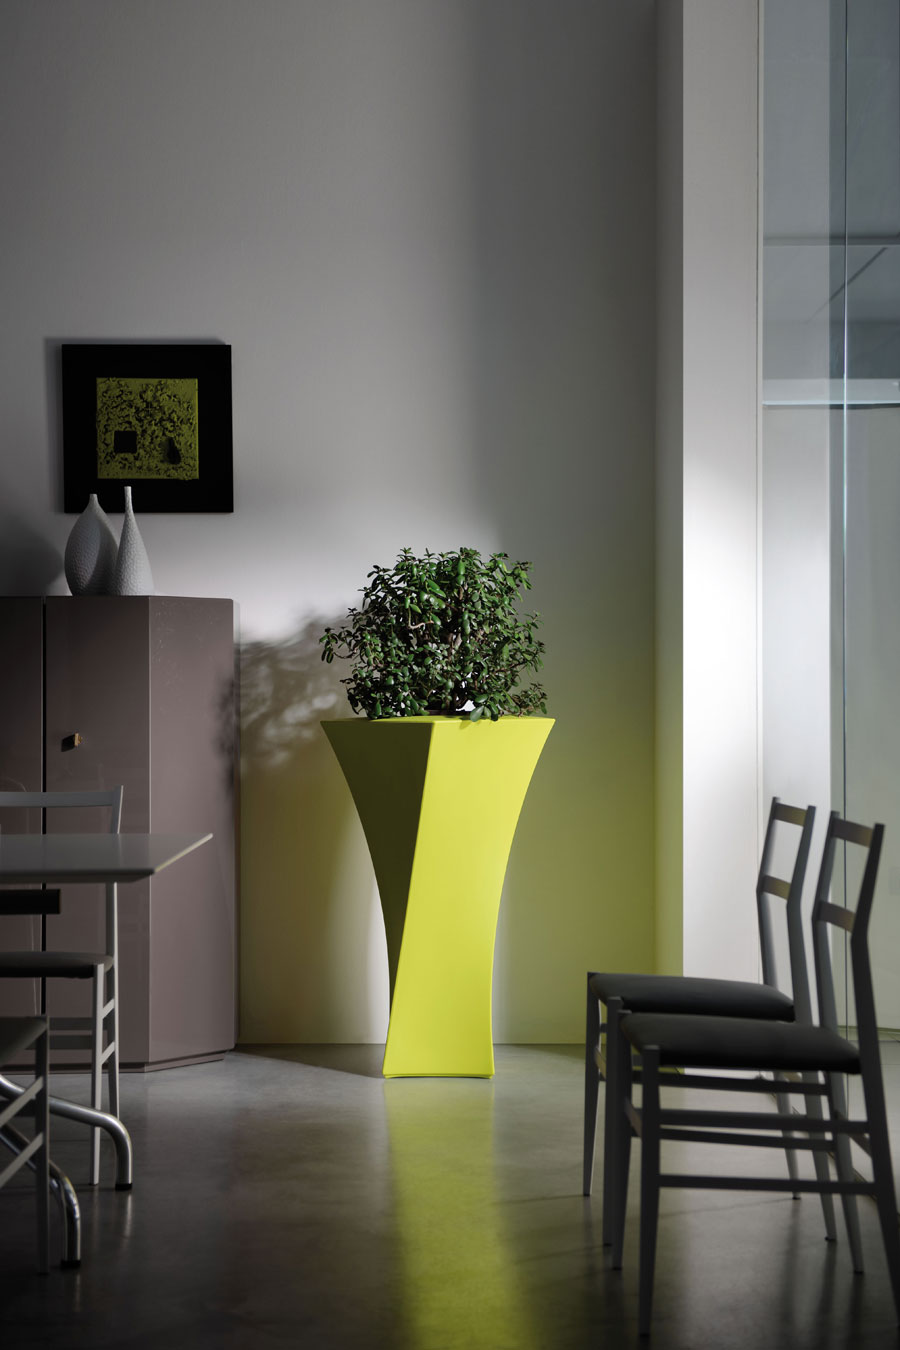 Vaso moderno esterno design interno giardino portavaso for Design interno moderno